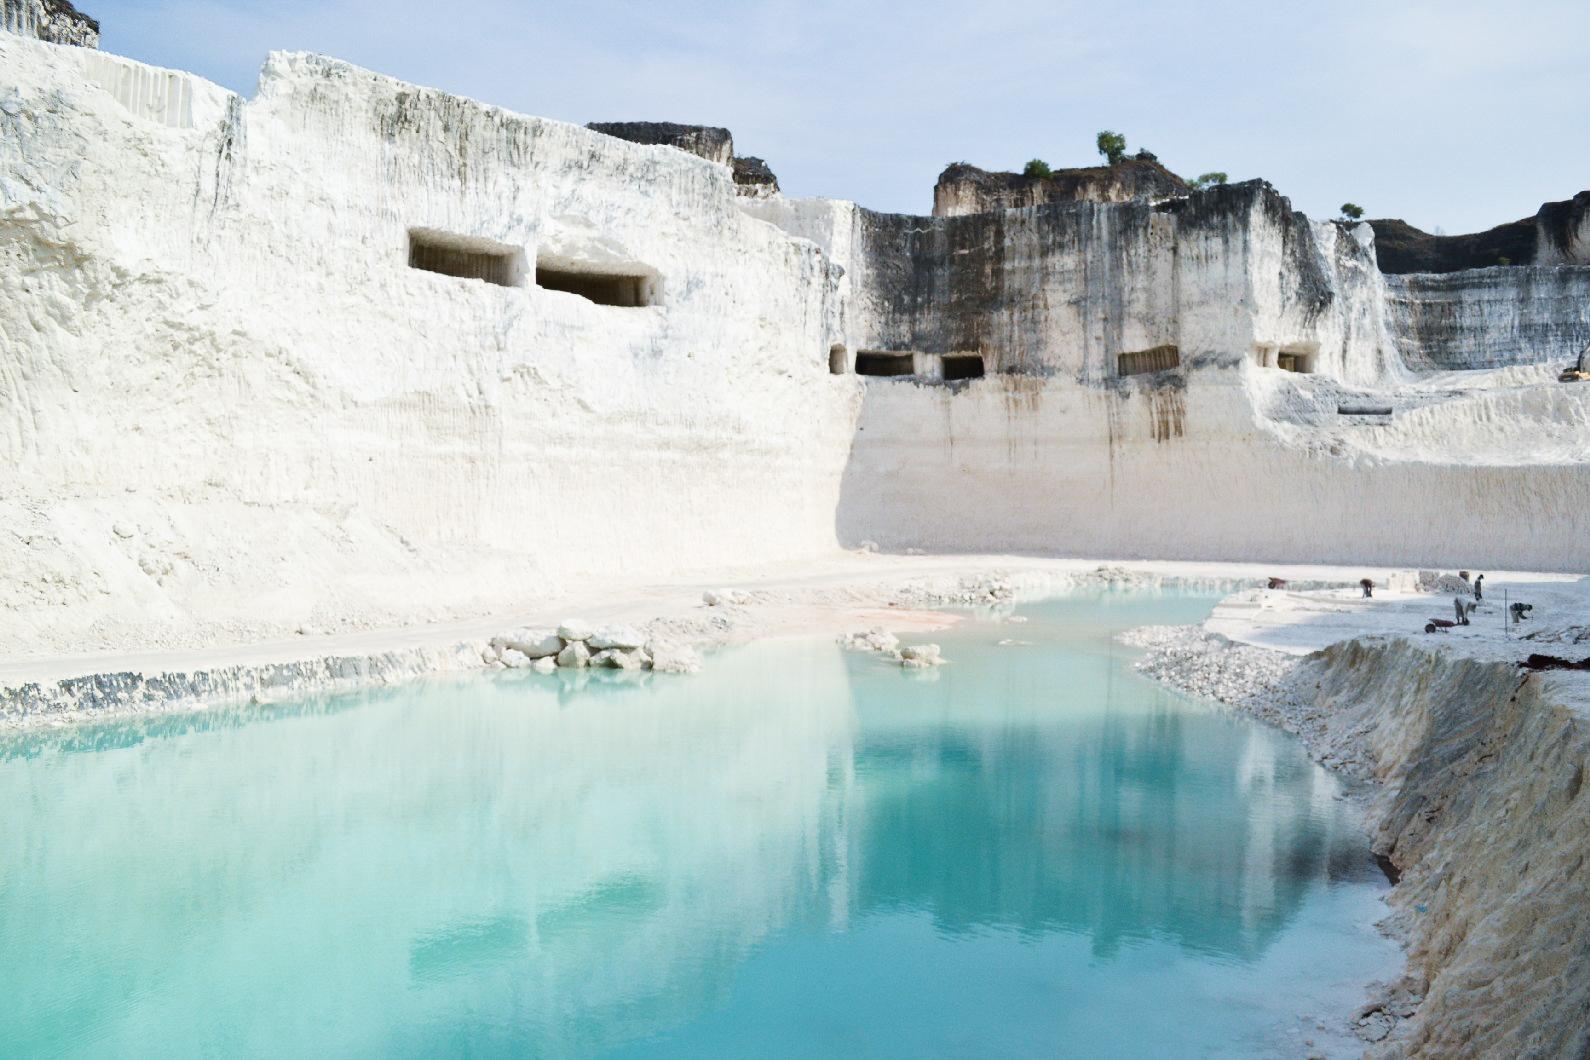 Birunya Kolam di Bukit Jaddih - 5 Wisata Bukit Kapur di Jawa Timur Eksotis